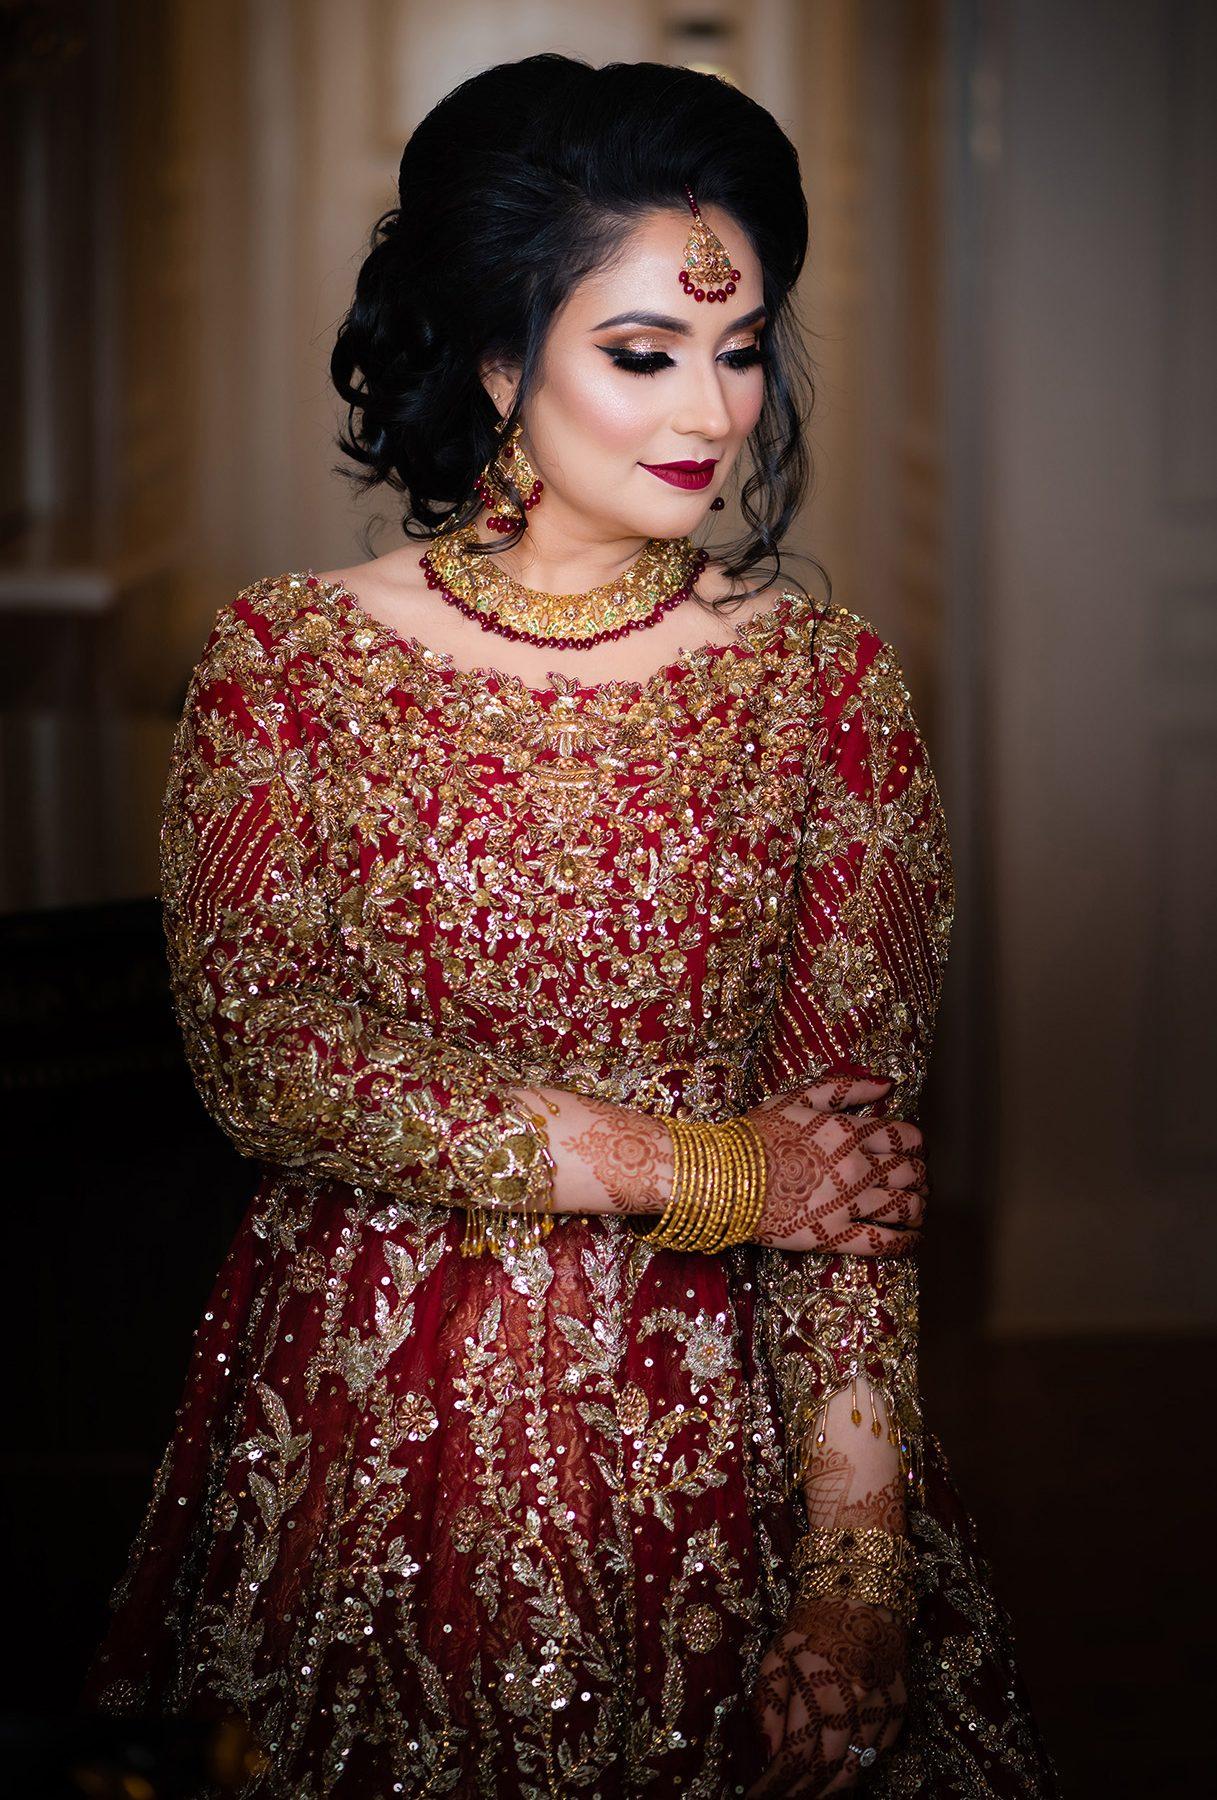 Best-Pakistani-Wedding-Photographer-1217x1800 South Asian Weddings